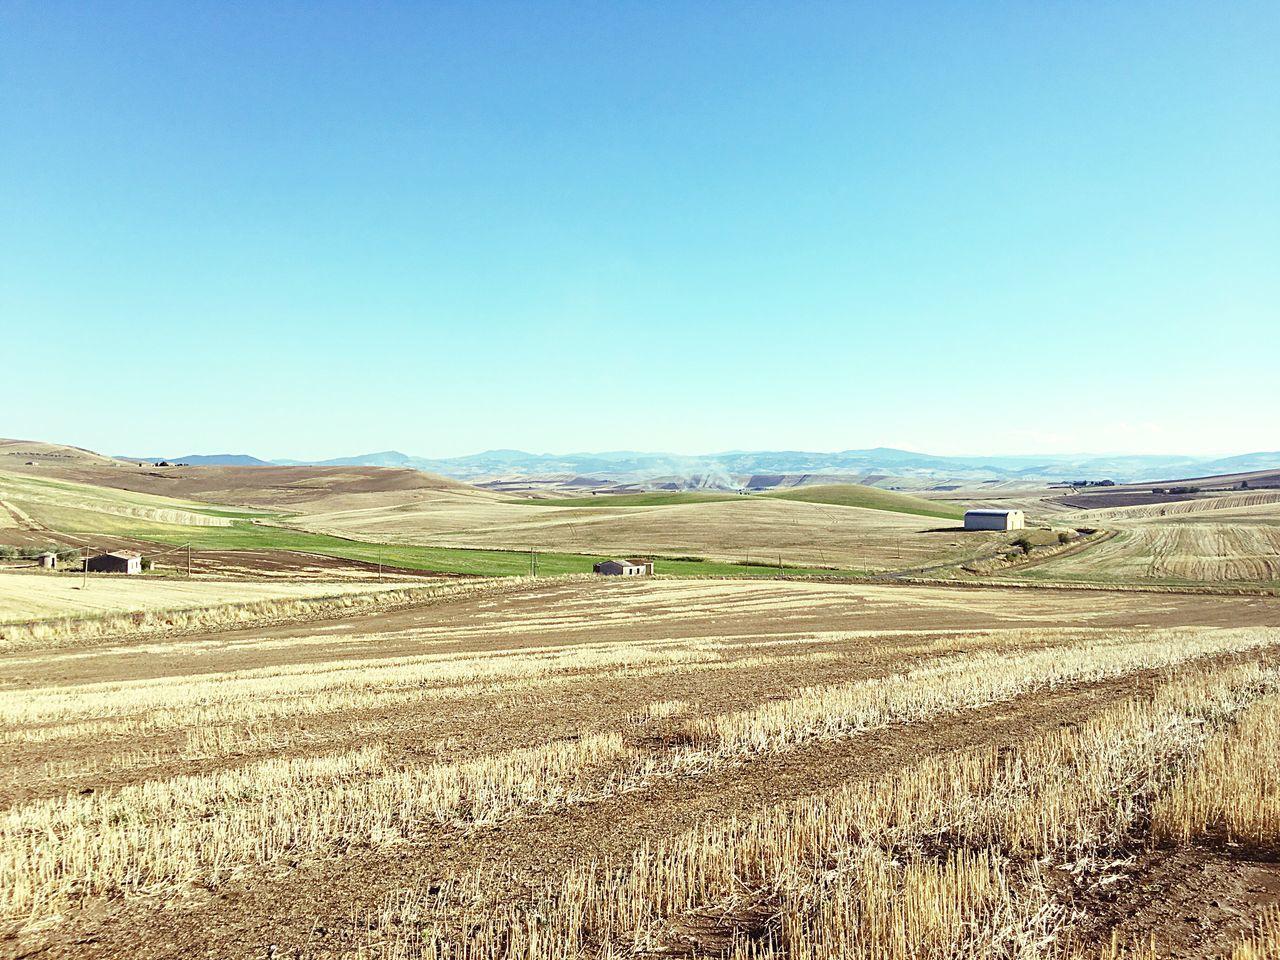 Scenics Landscape Countryside Italy Harvesting Basilicata, Italy